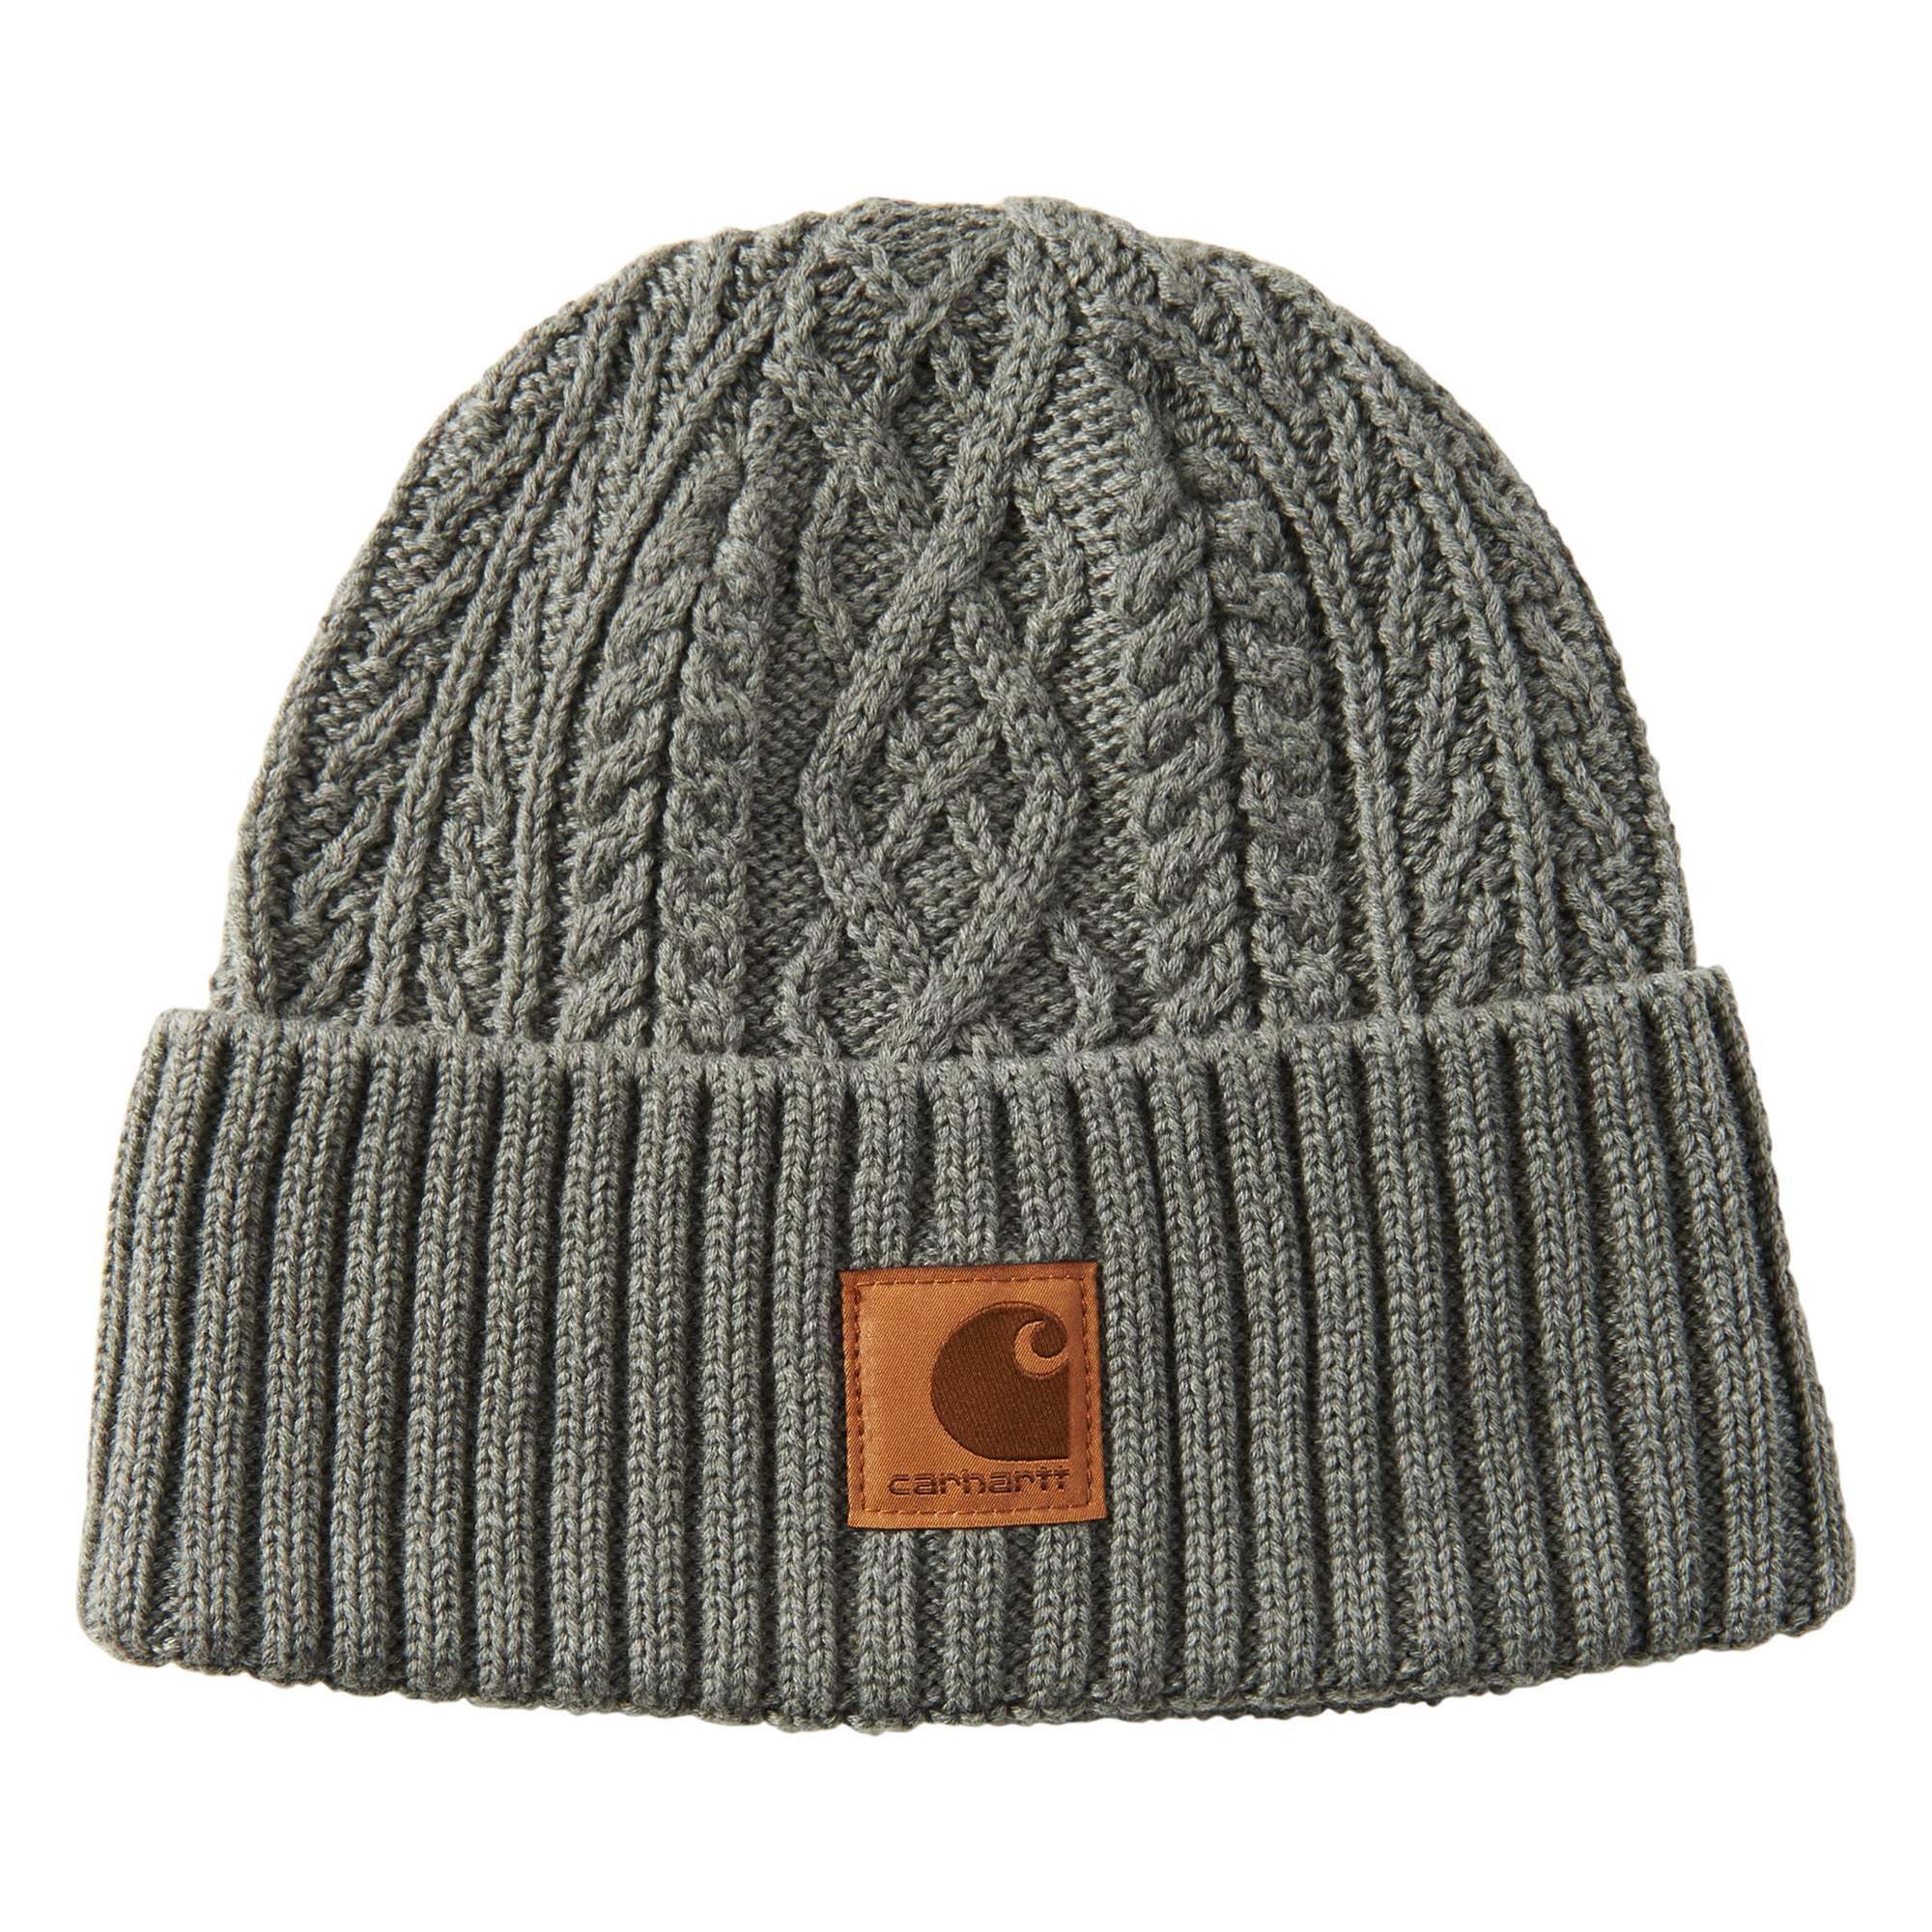 Plated Fisherman Hat